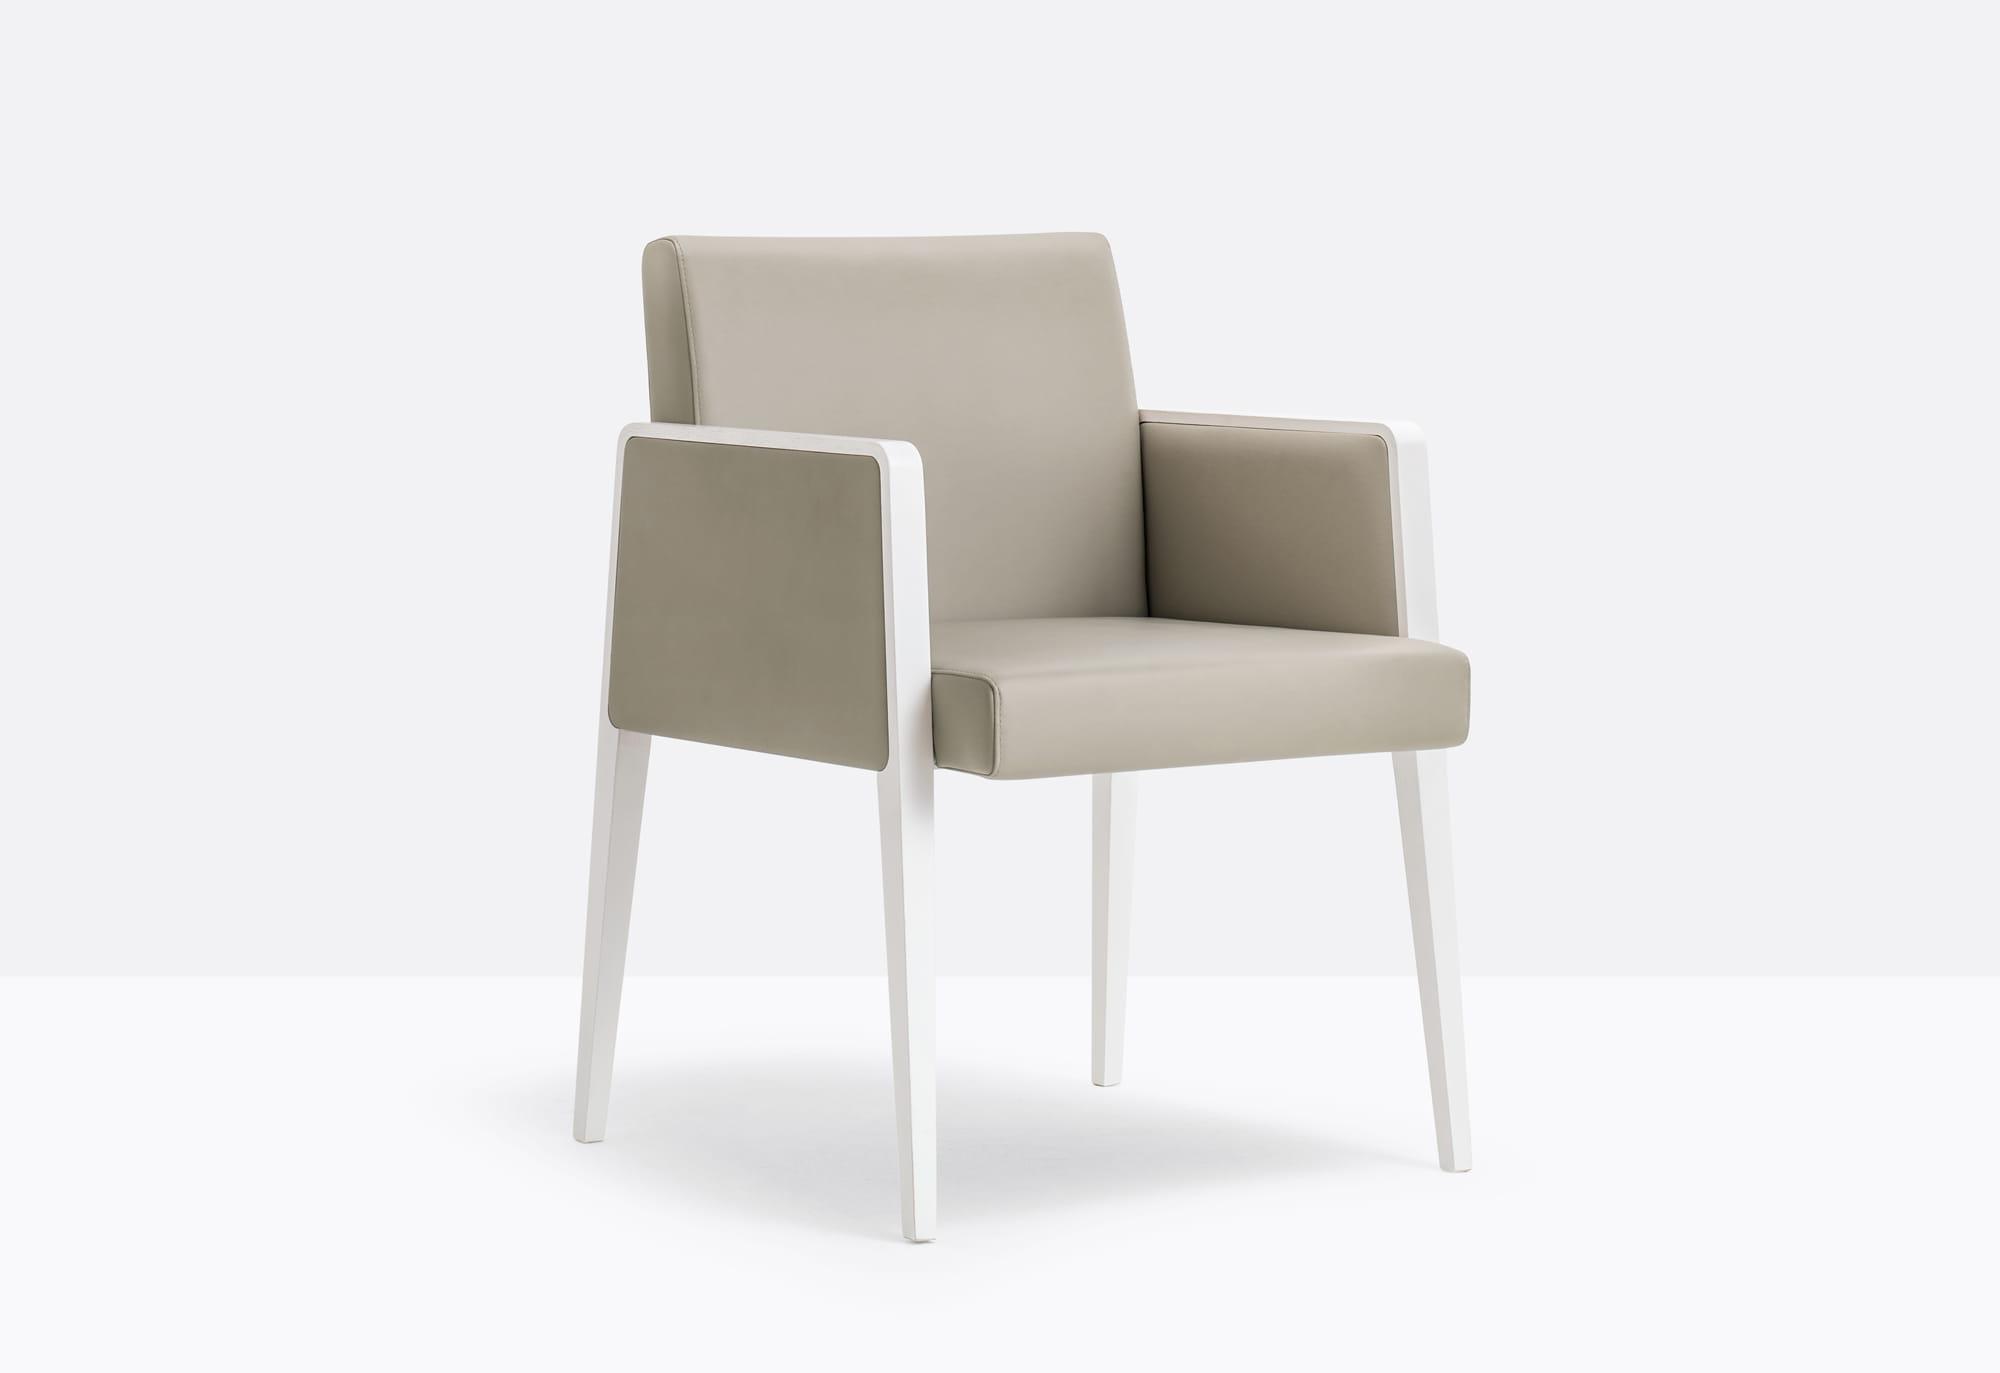 Pedrali Krzesło Jil 525 RS Naturalny jasny